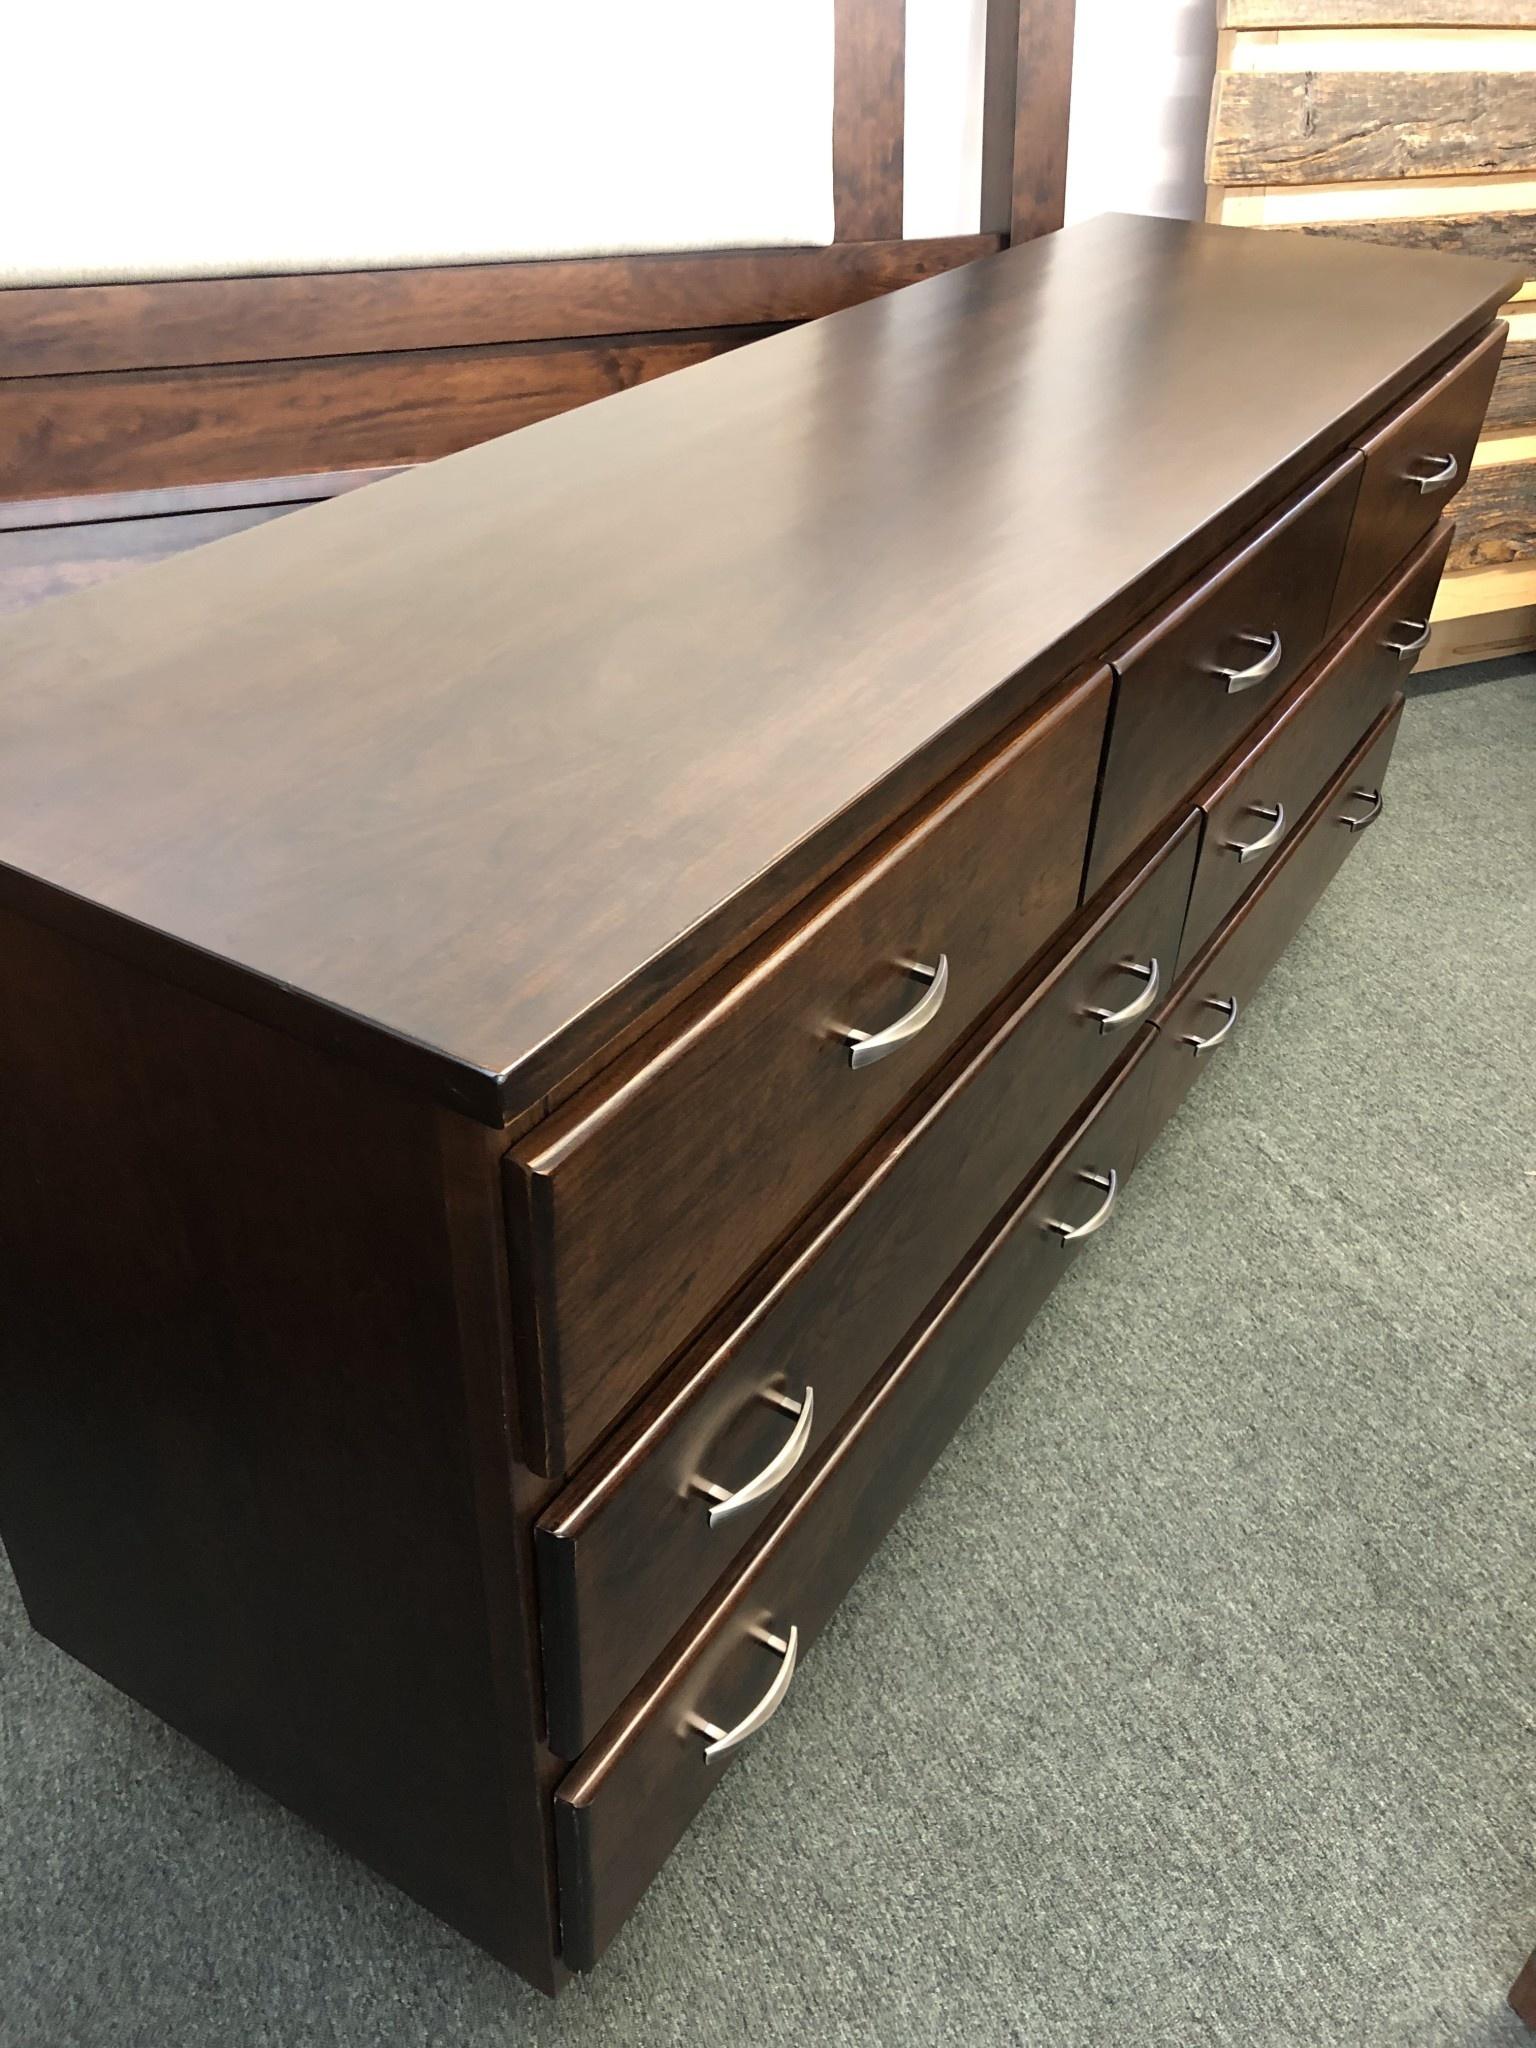 Green Gables Cherry Avenue 7 Drawer Dresser 34H x 72W x 20D